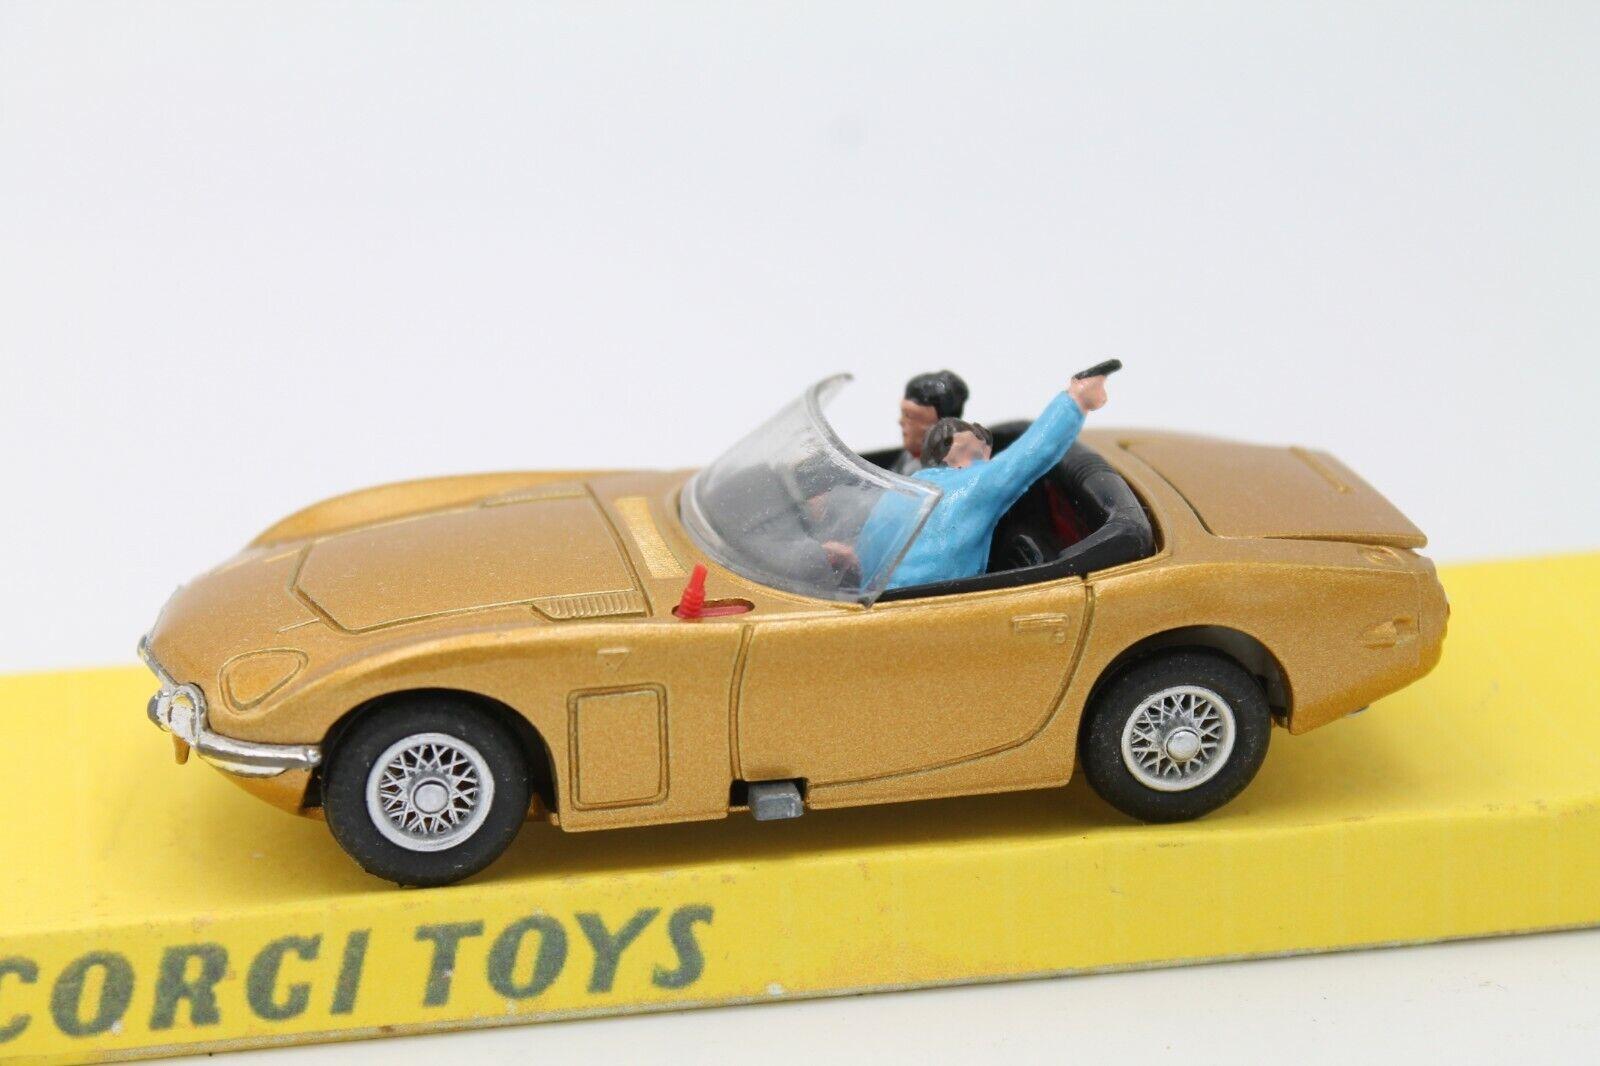 CORGI SpielzeugS  SpielzeugOTA 2000  GT  JAMES BOND  CODE 3  Gold